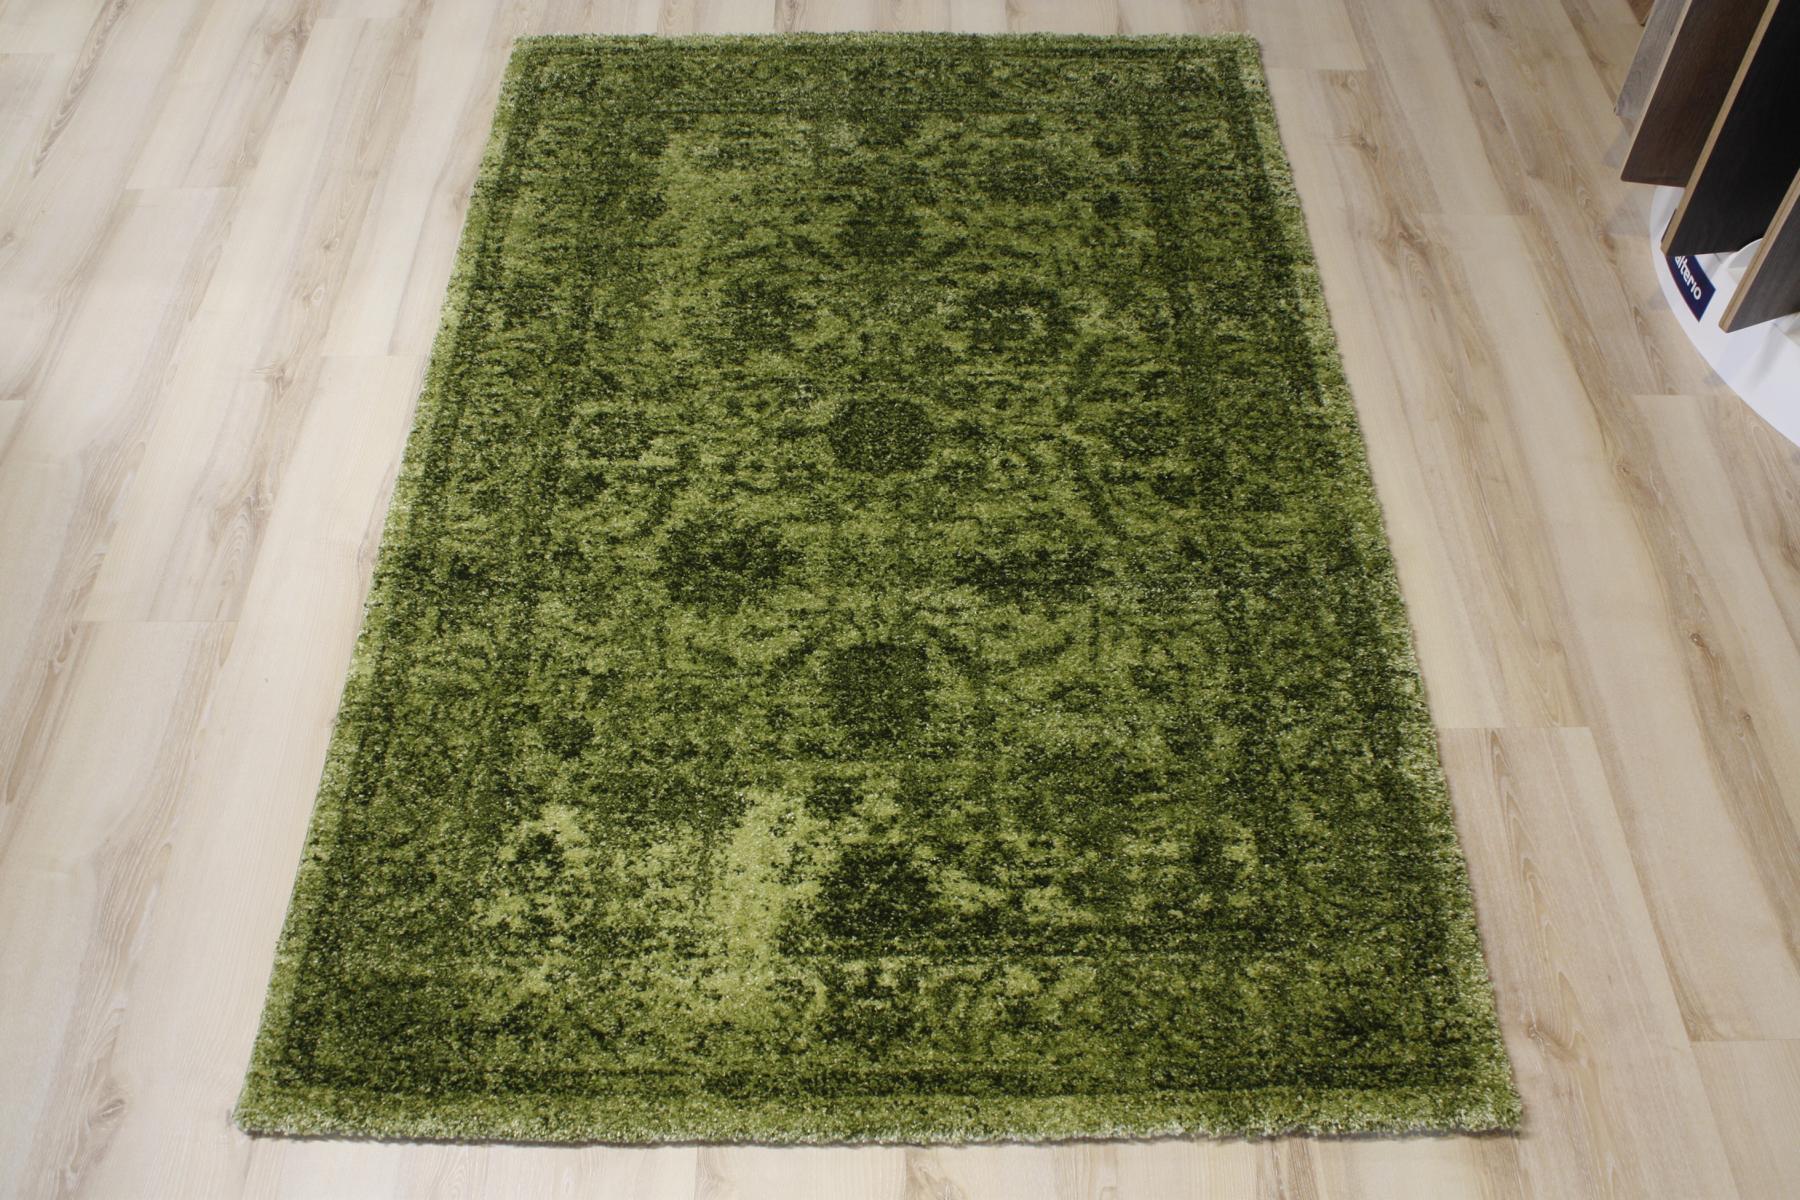 astra samoa teppich 6870 161 030 gr n 120x180cm neu ebay. Black Bedroom Furniture Sets. Home Design Ideas